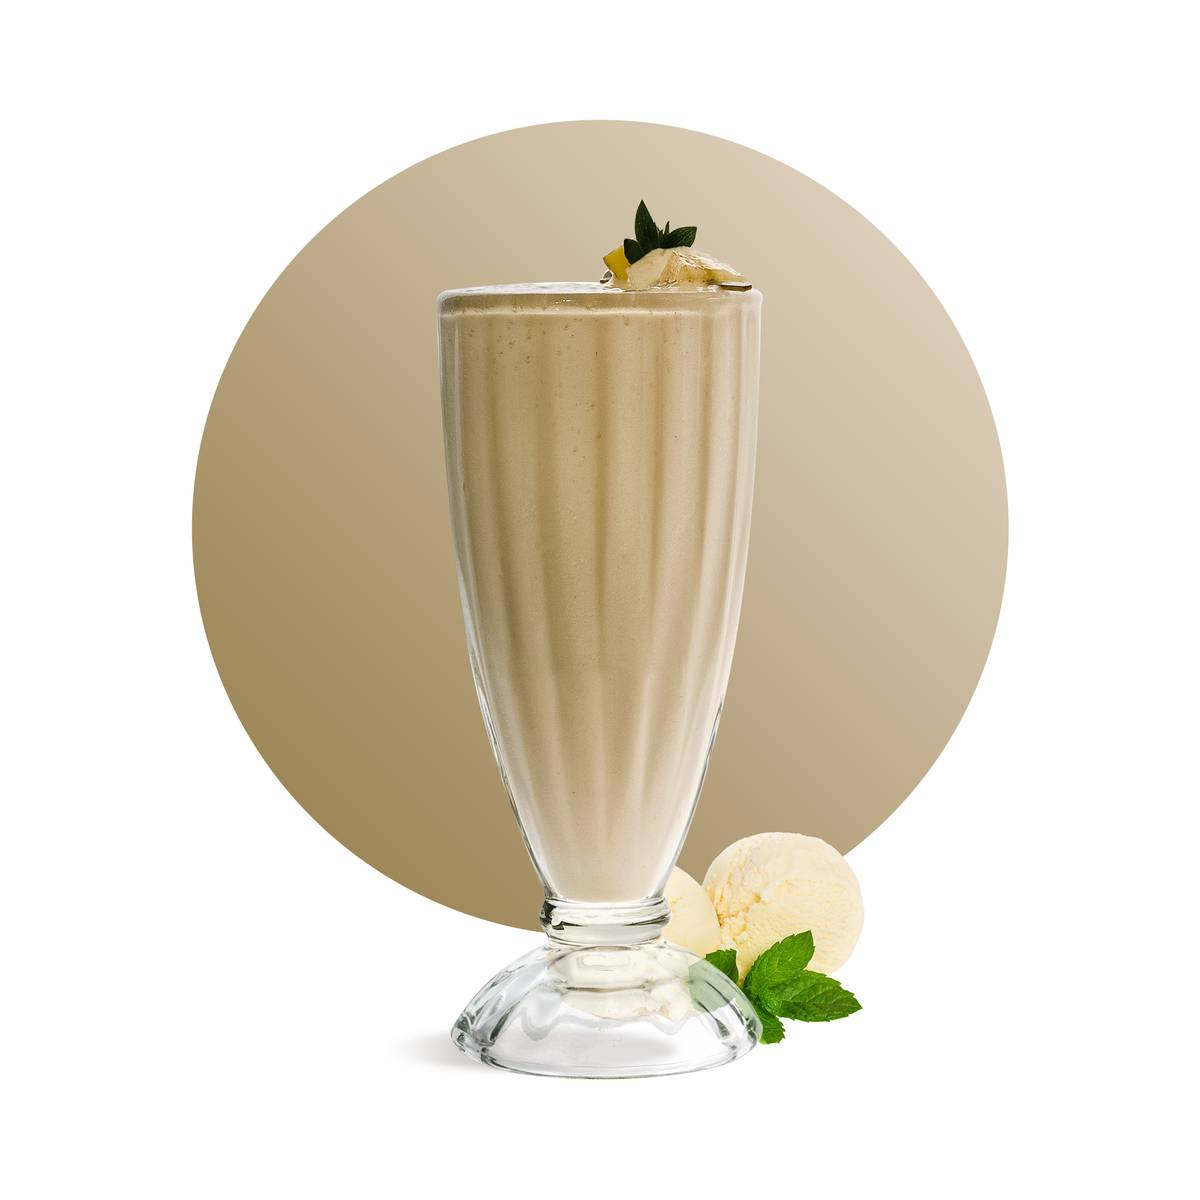 Iced Latte Shake Drink Recipe